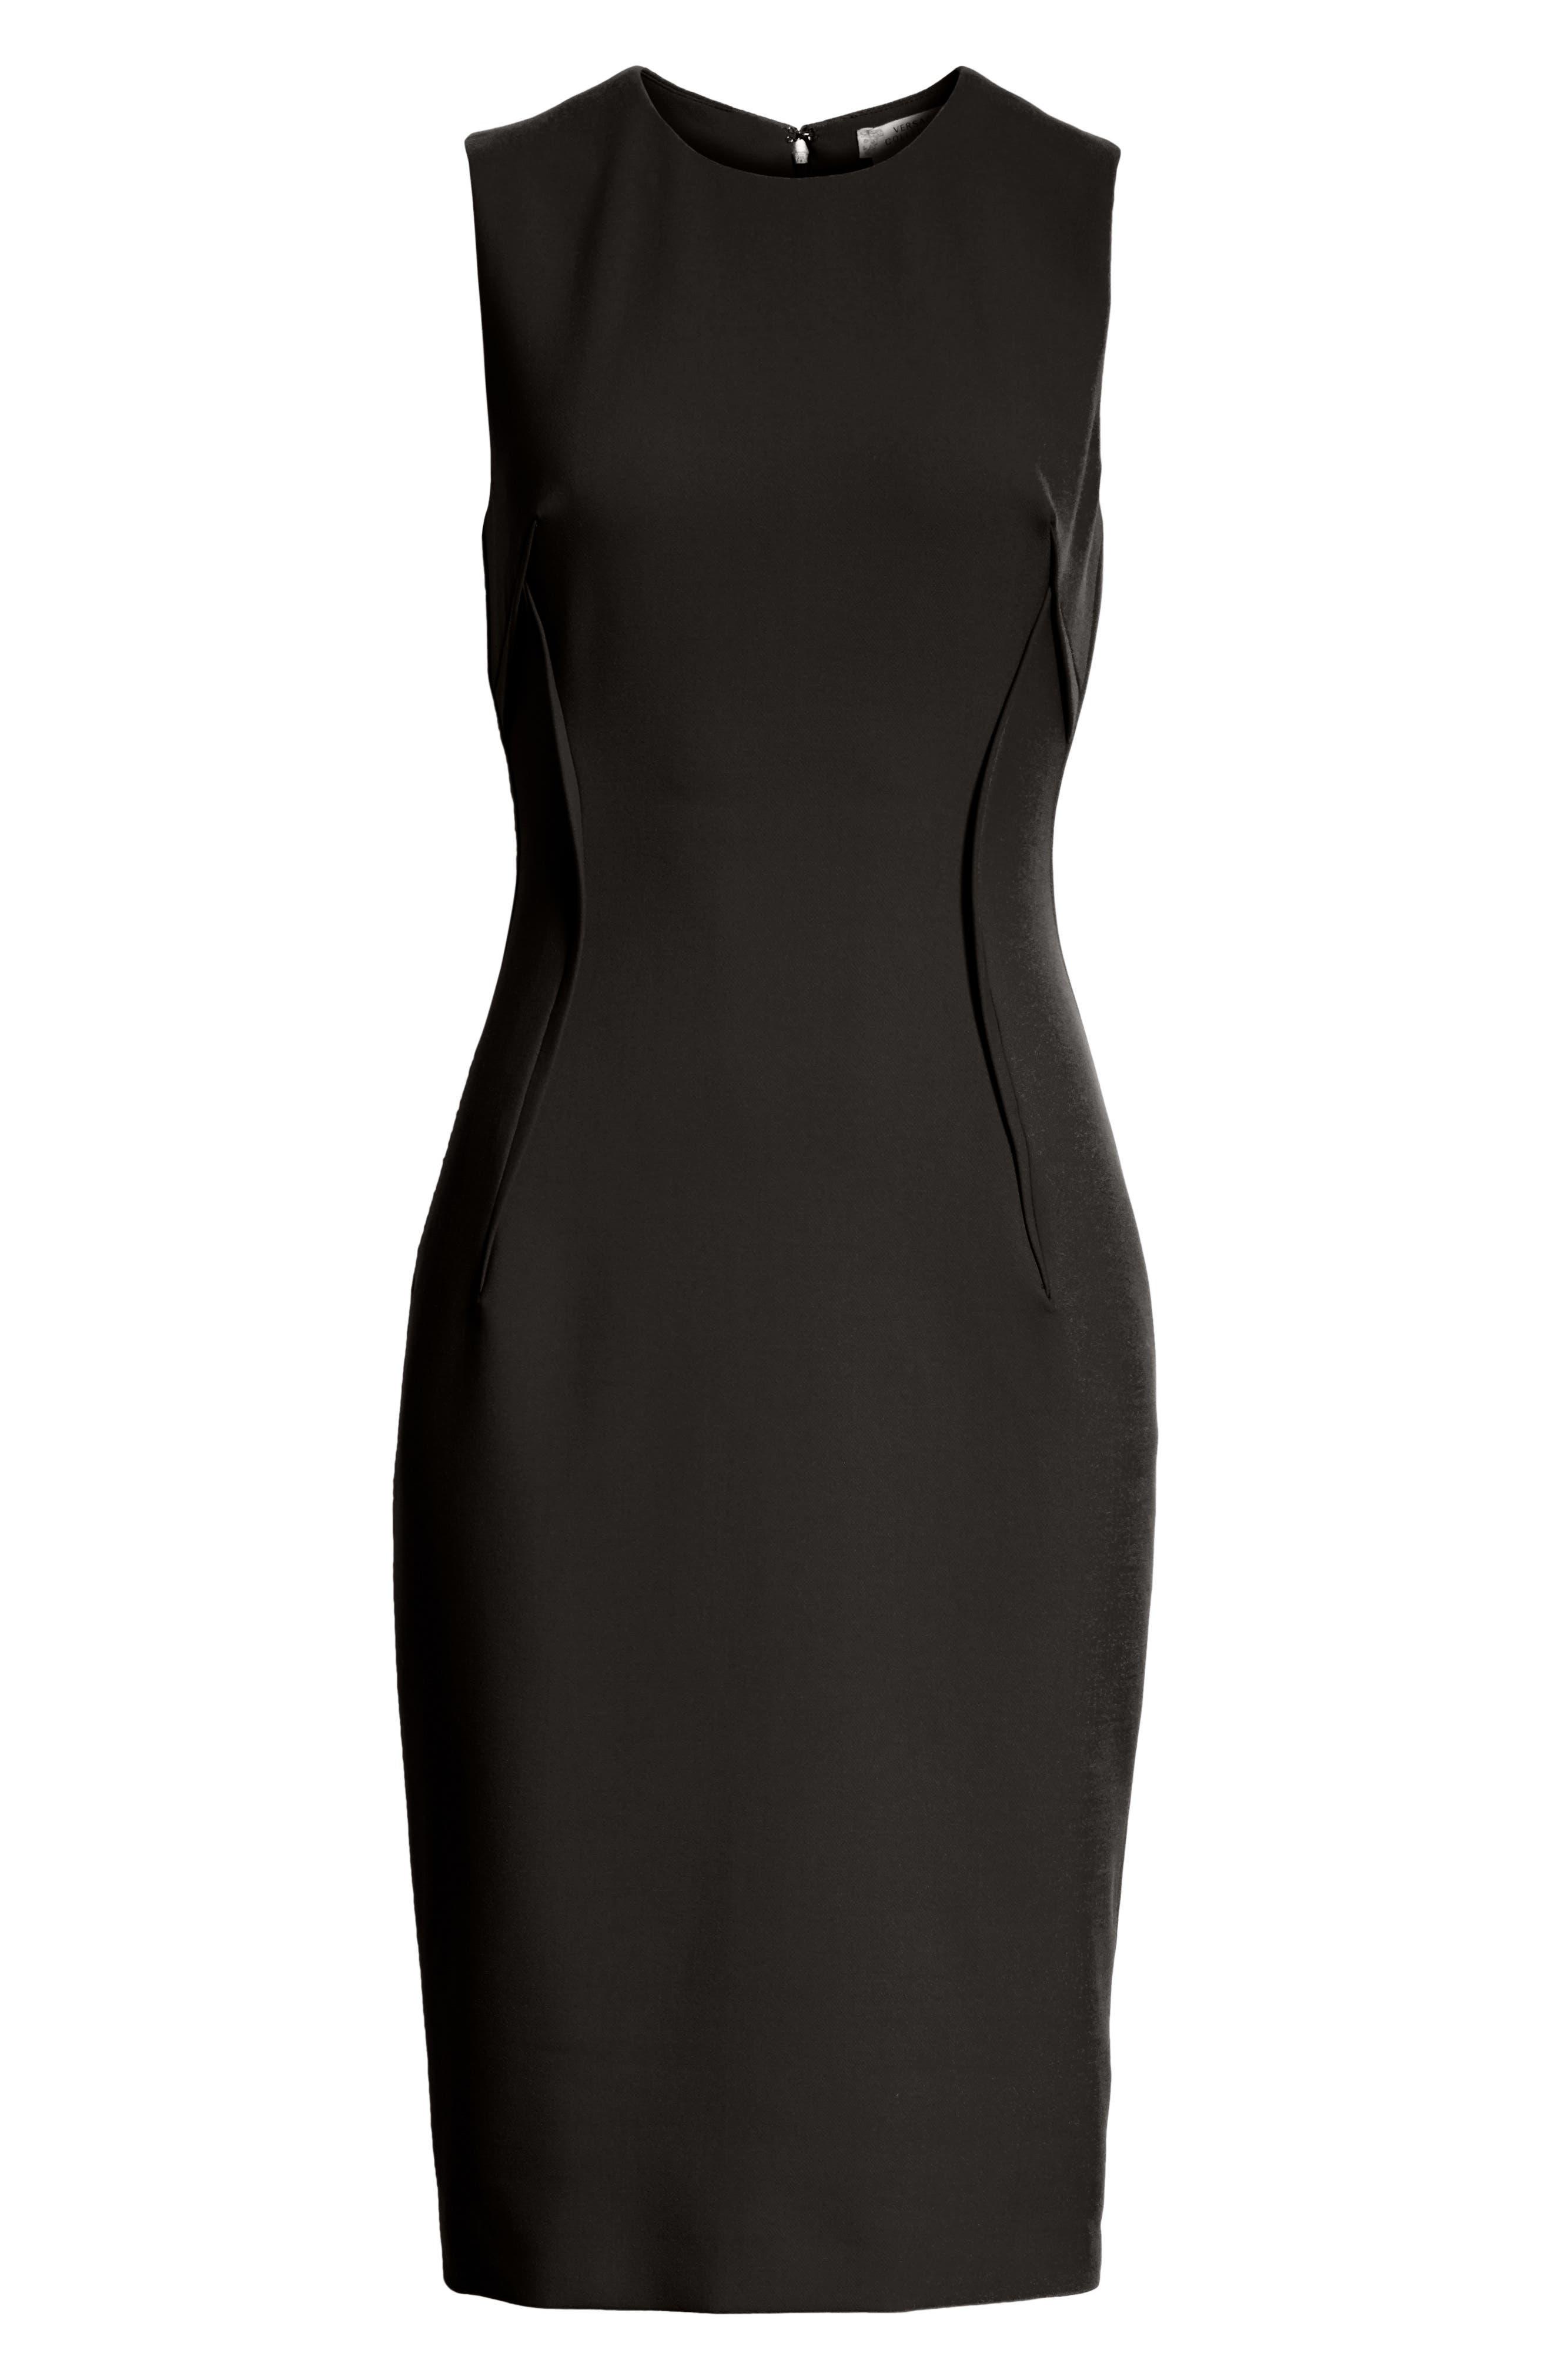 VERSACE COLLECTION, Stretch Cady Sheath Dress, Alternate thumbnail 7, color, BLACK